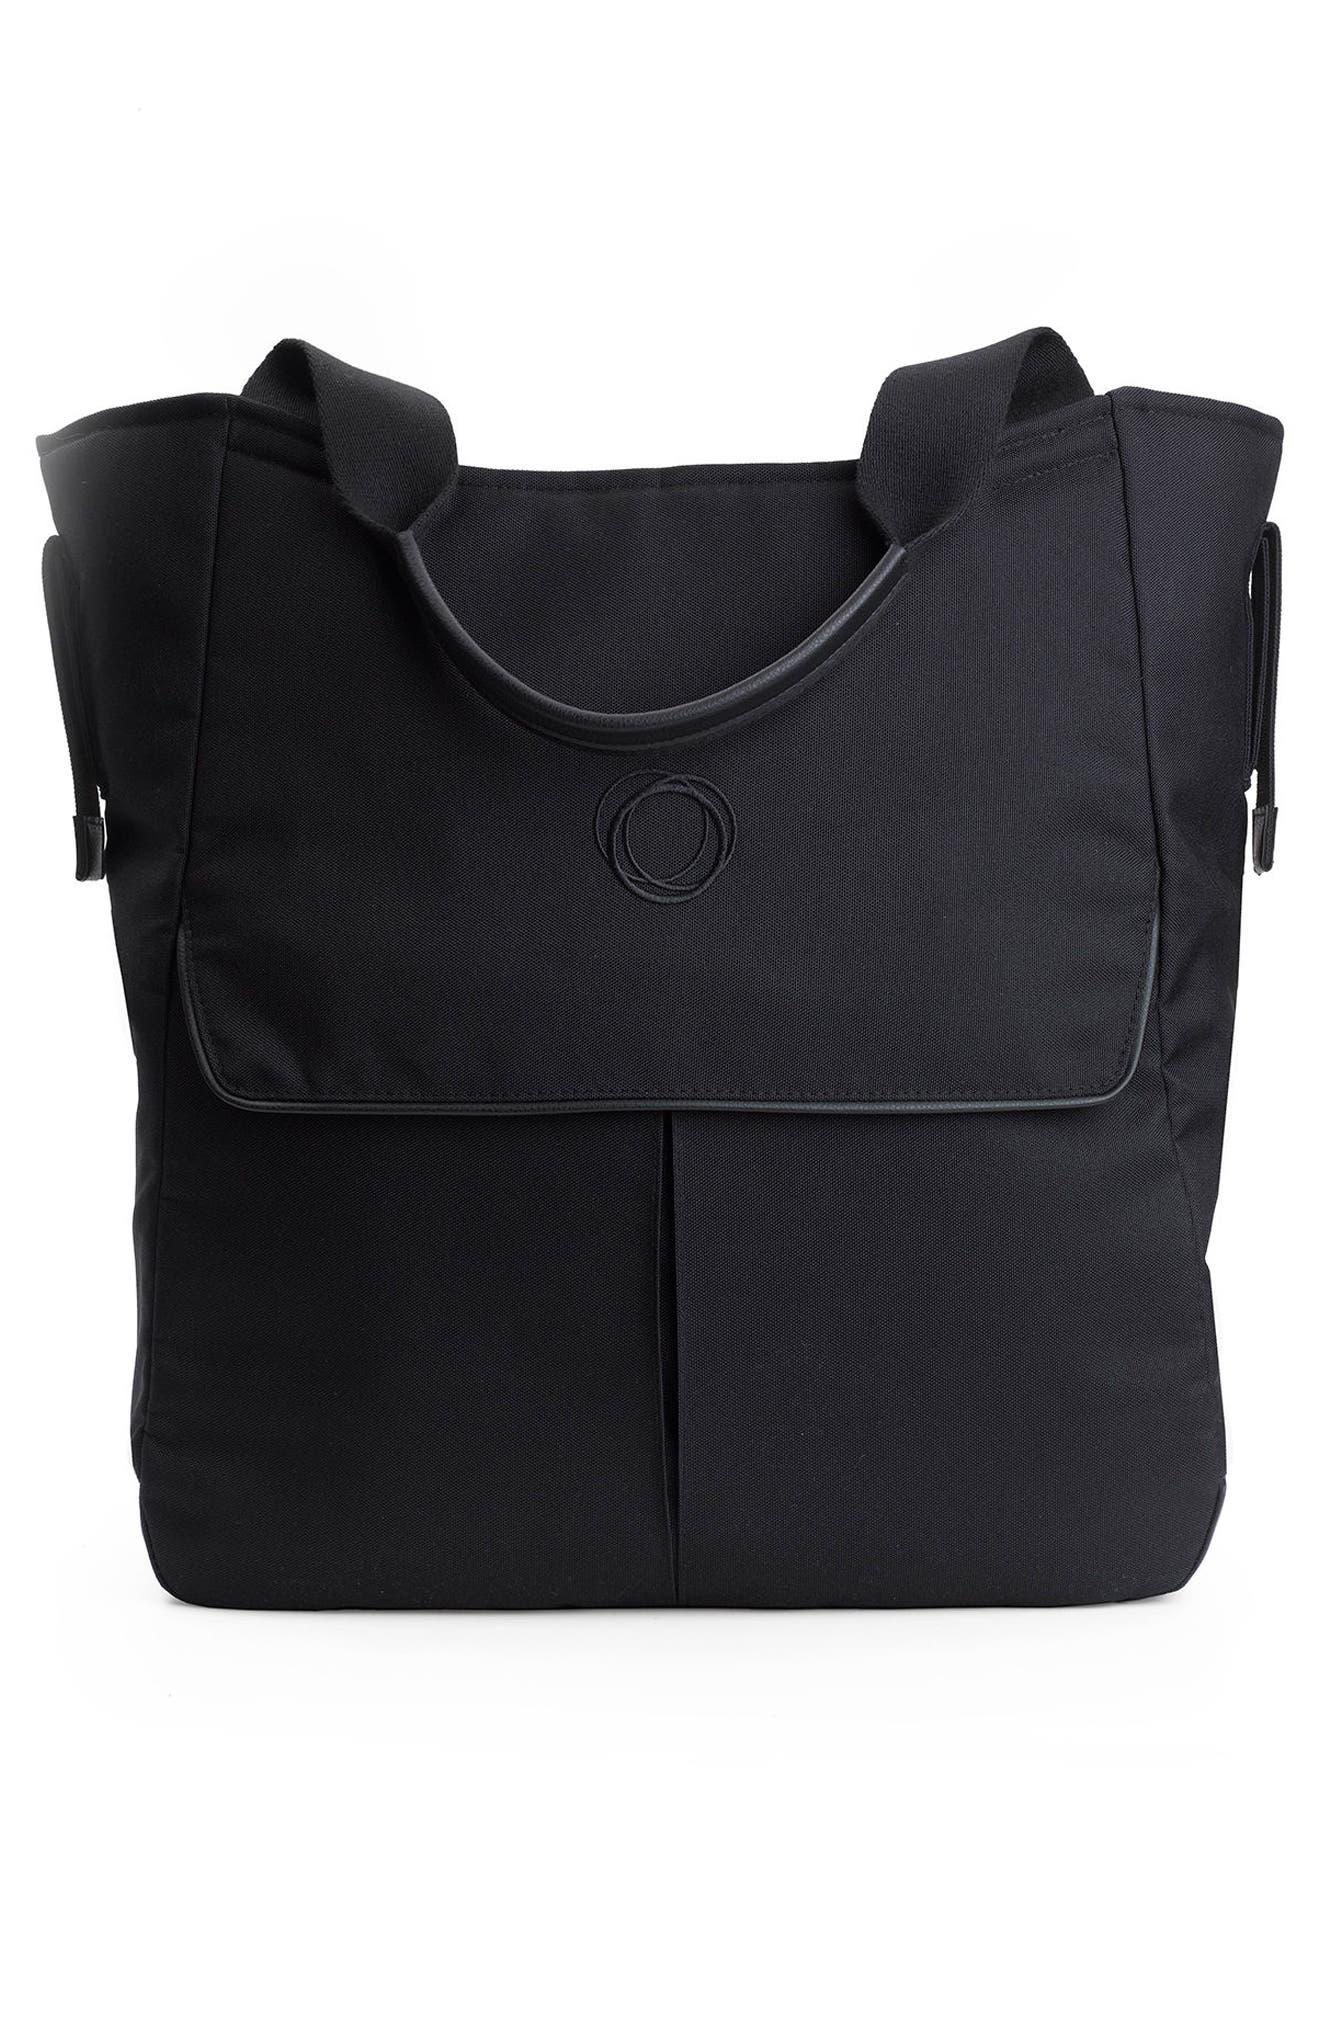 Mammoth Bee Stroller Organizer Bag,                             Alternate thumbnail 2, color,                             BLACK